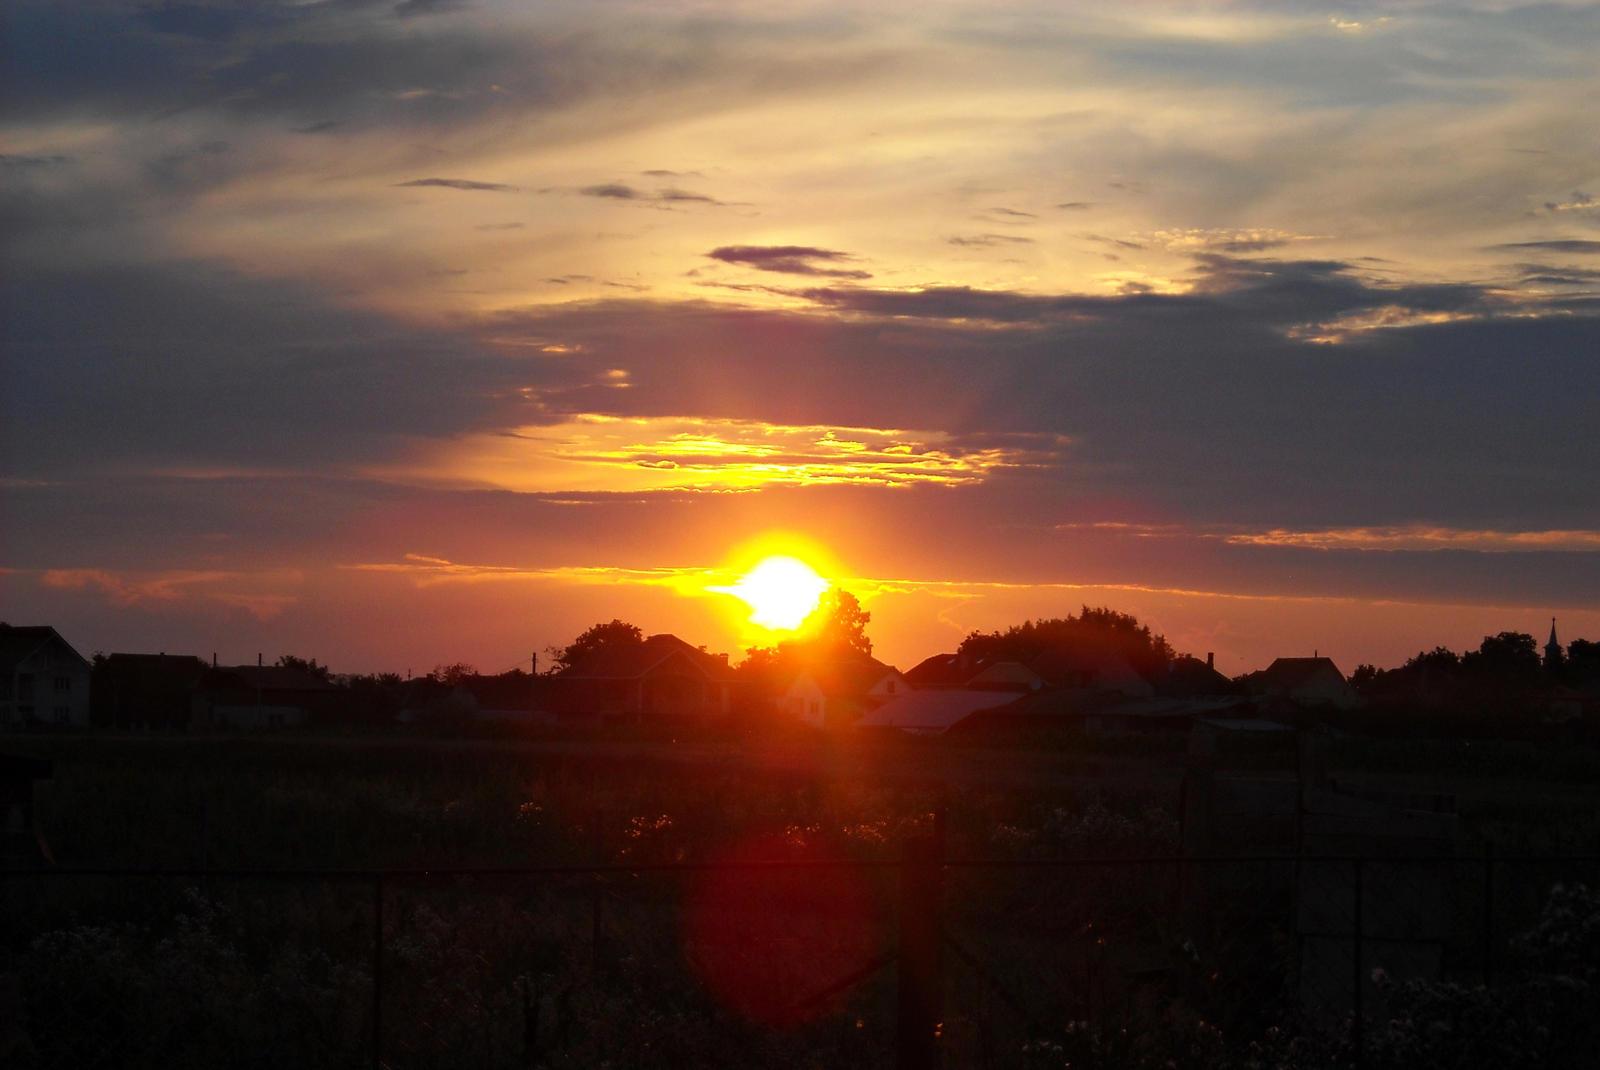 Sunset VI by Georgya10